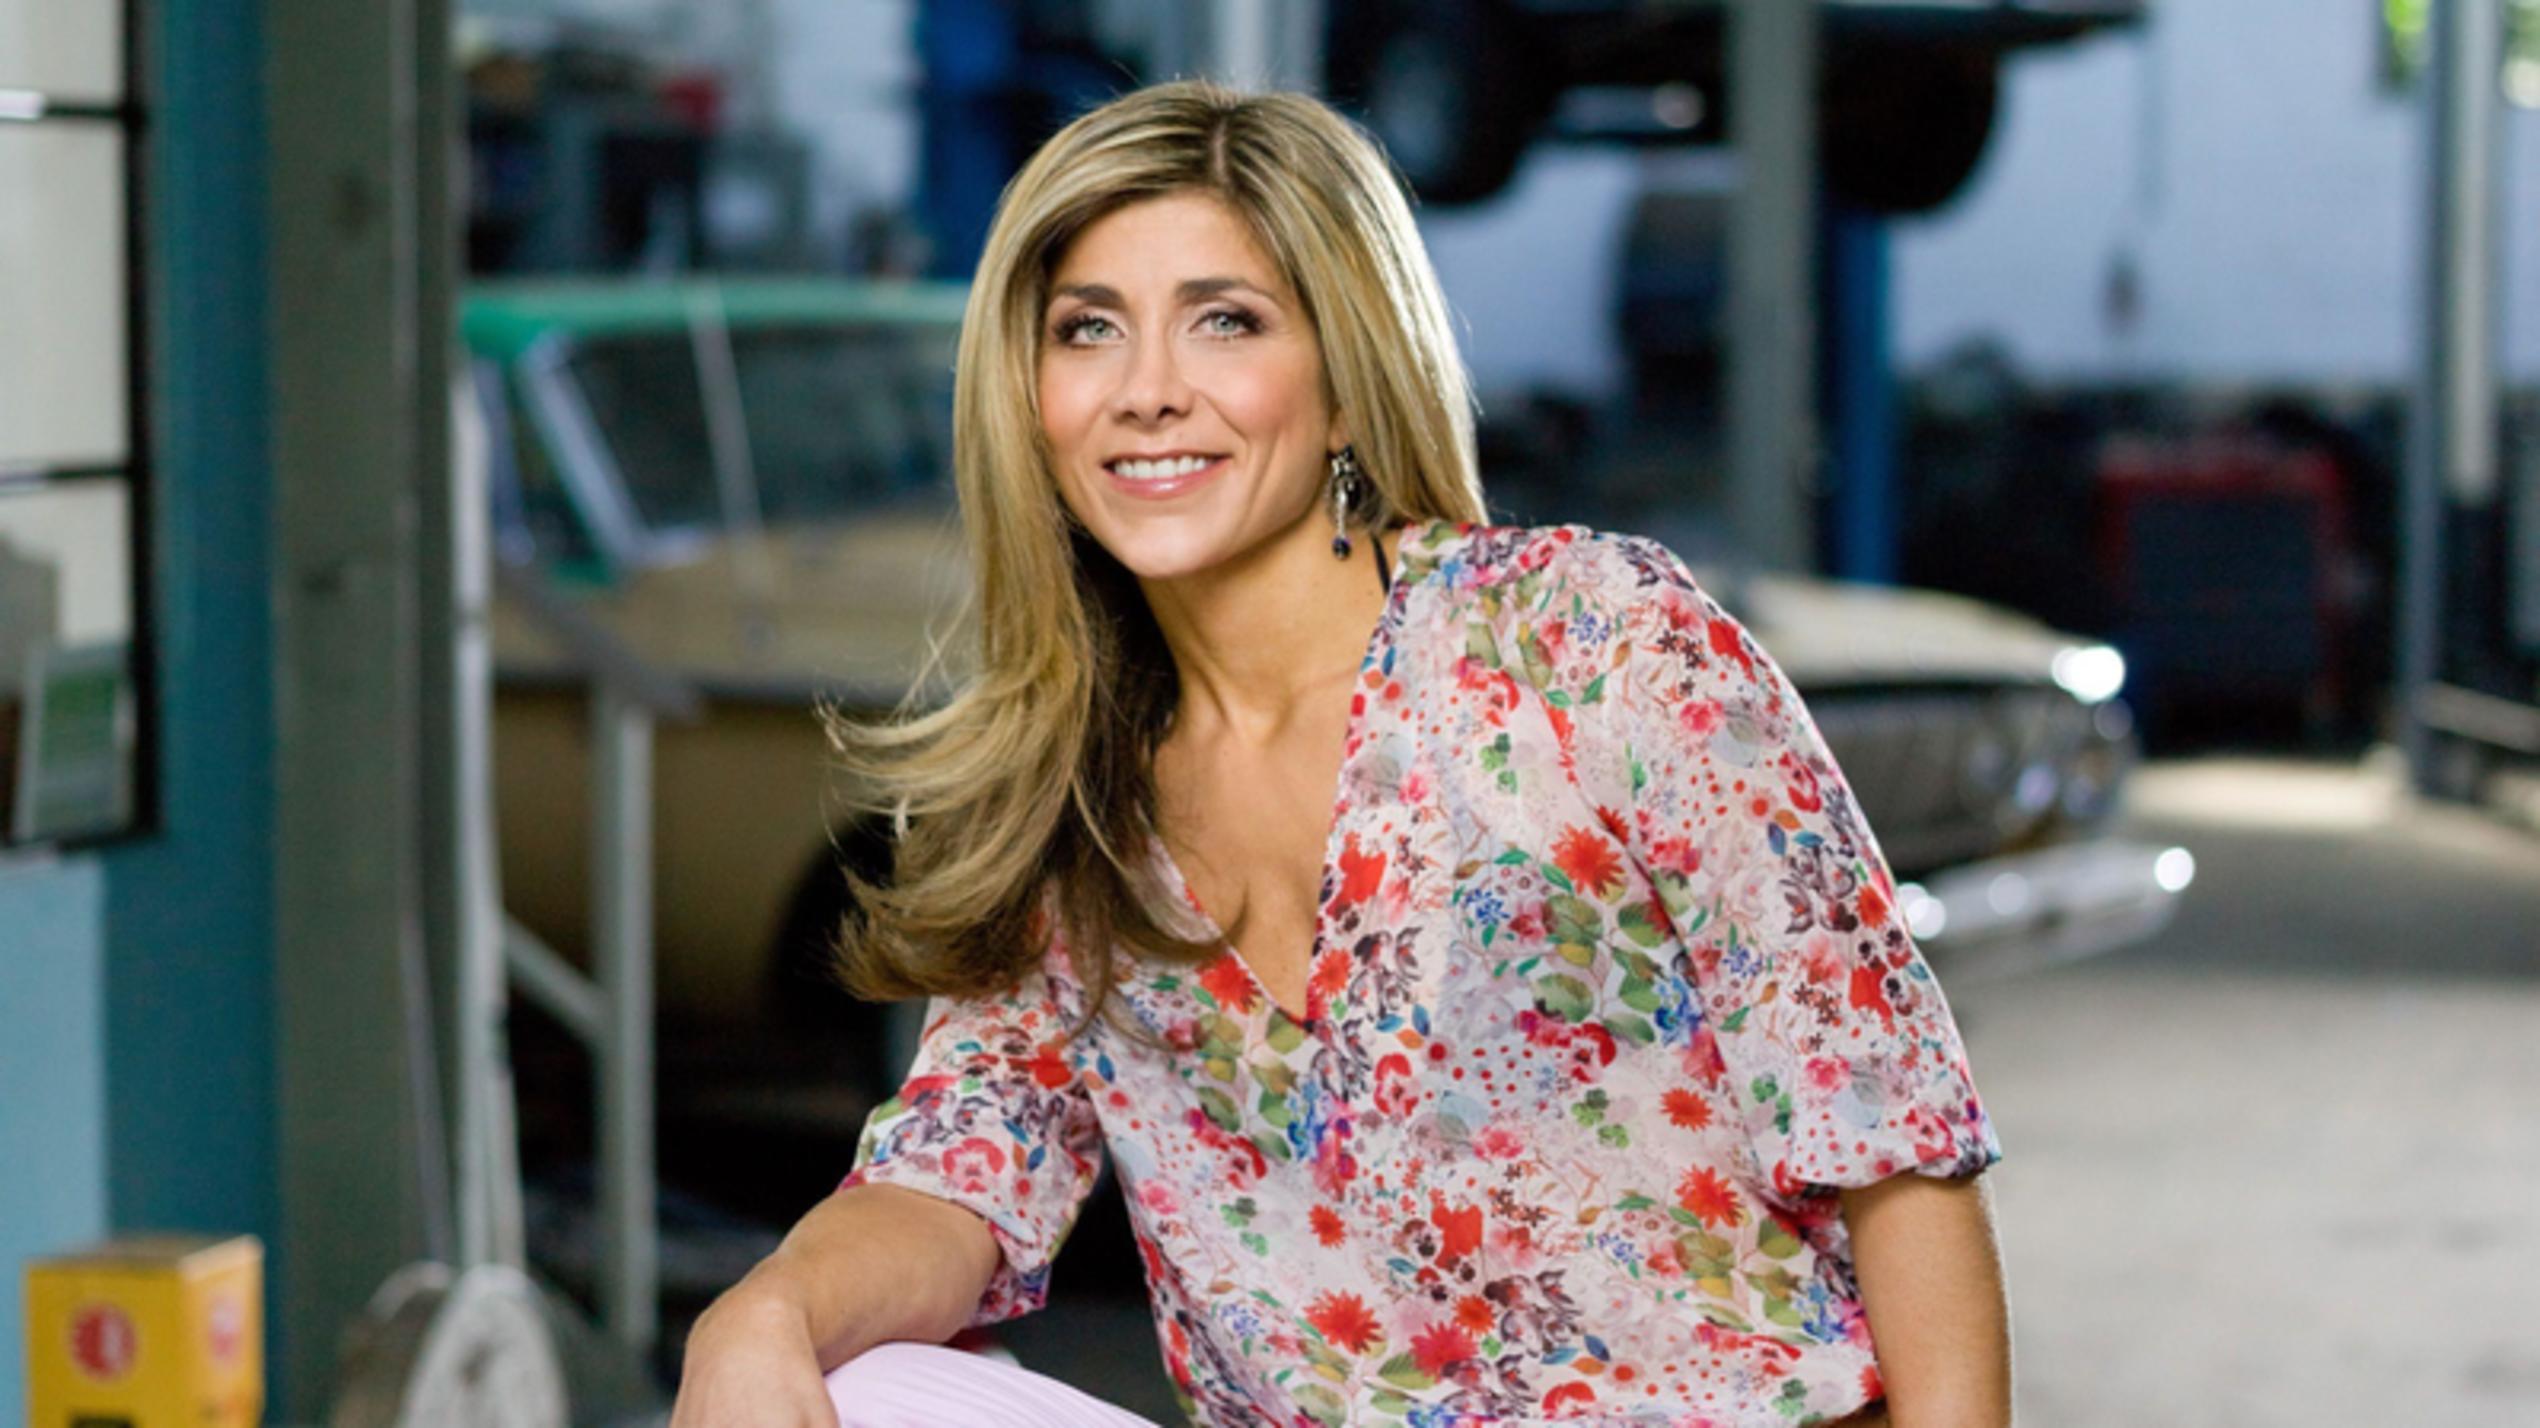 Panagiota Petridou: Bereut sie die Nasen-OP? | Promiflash.de